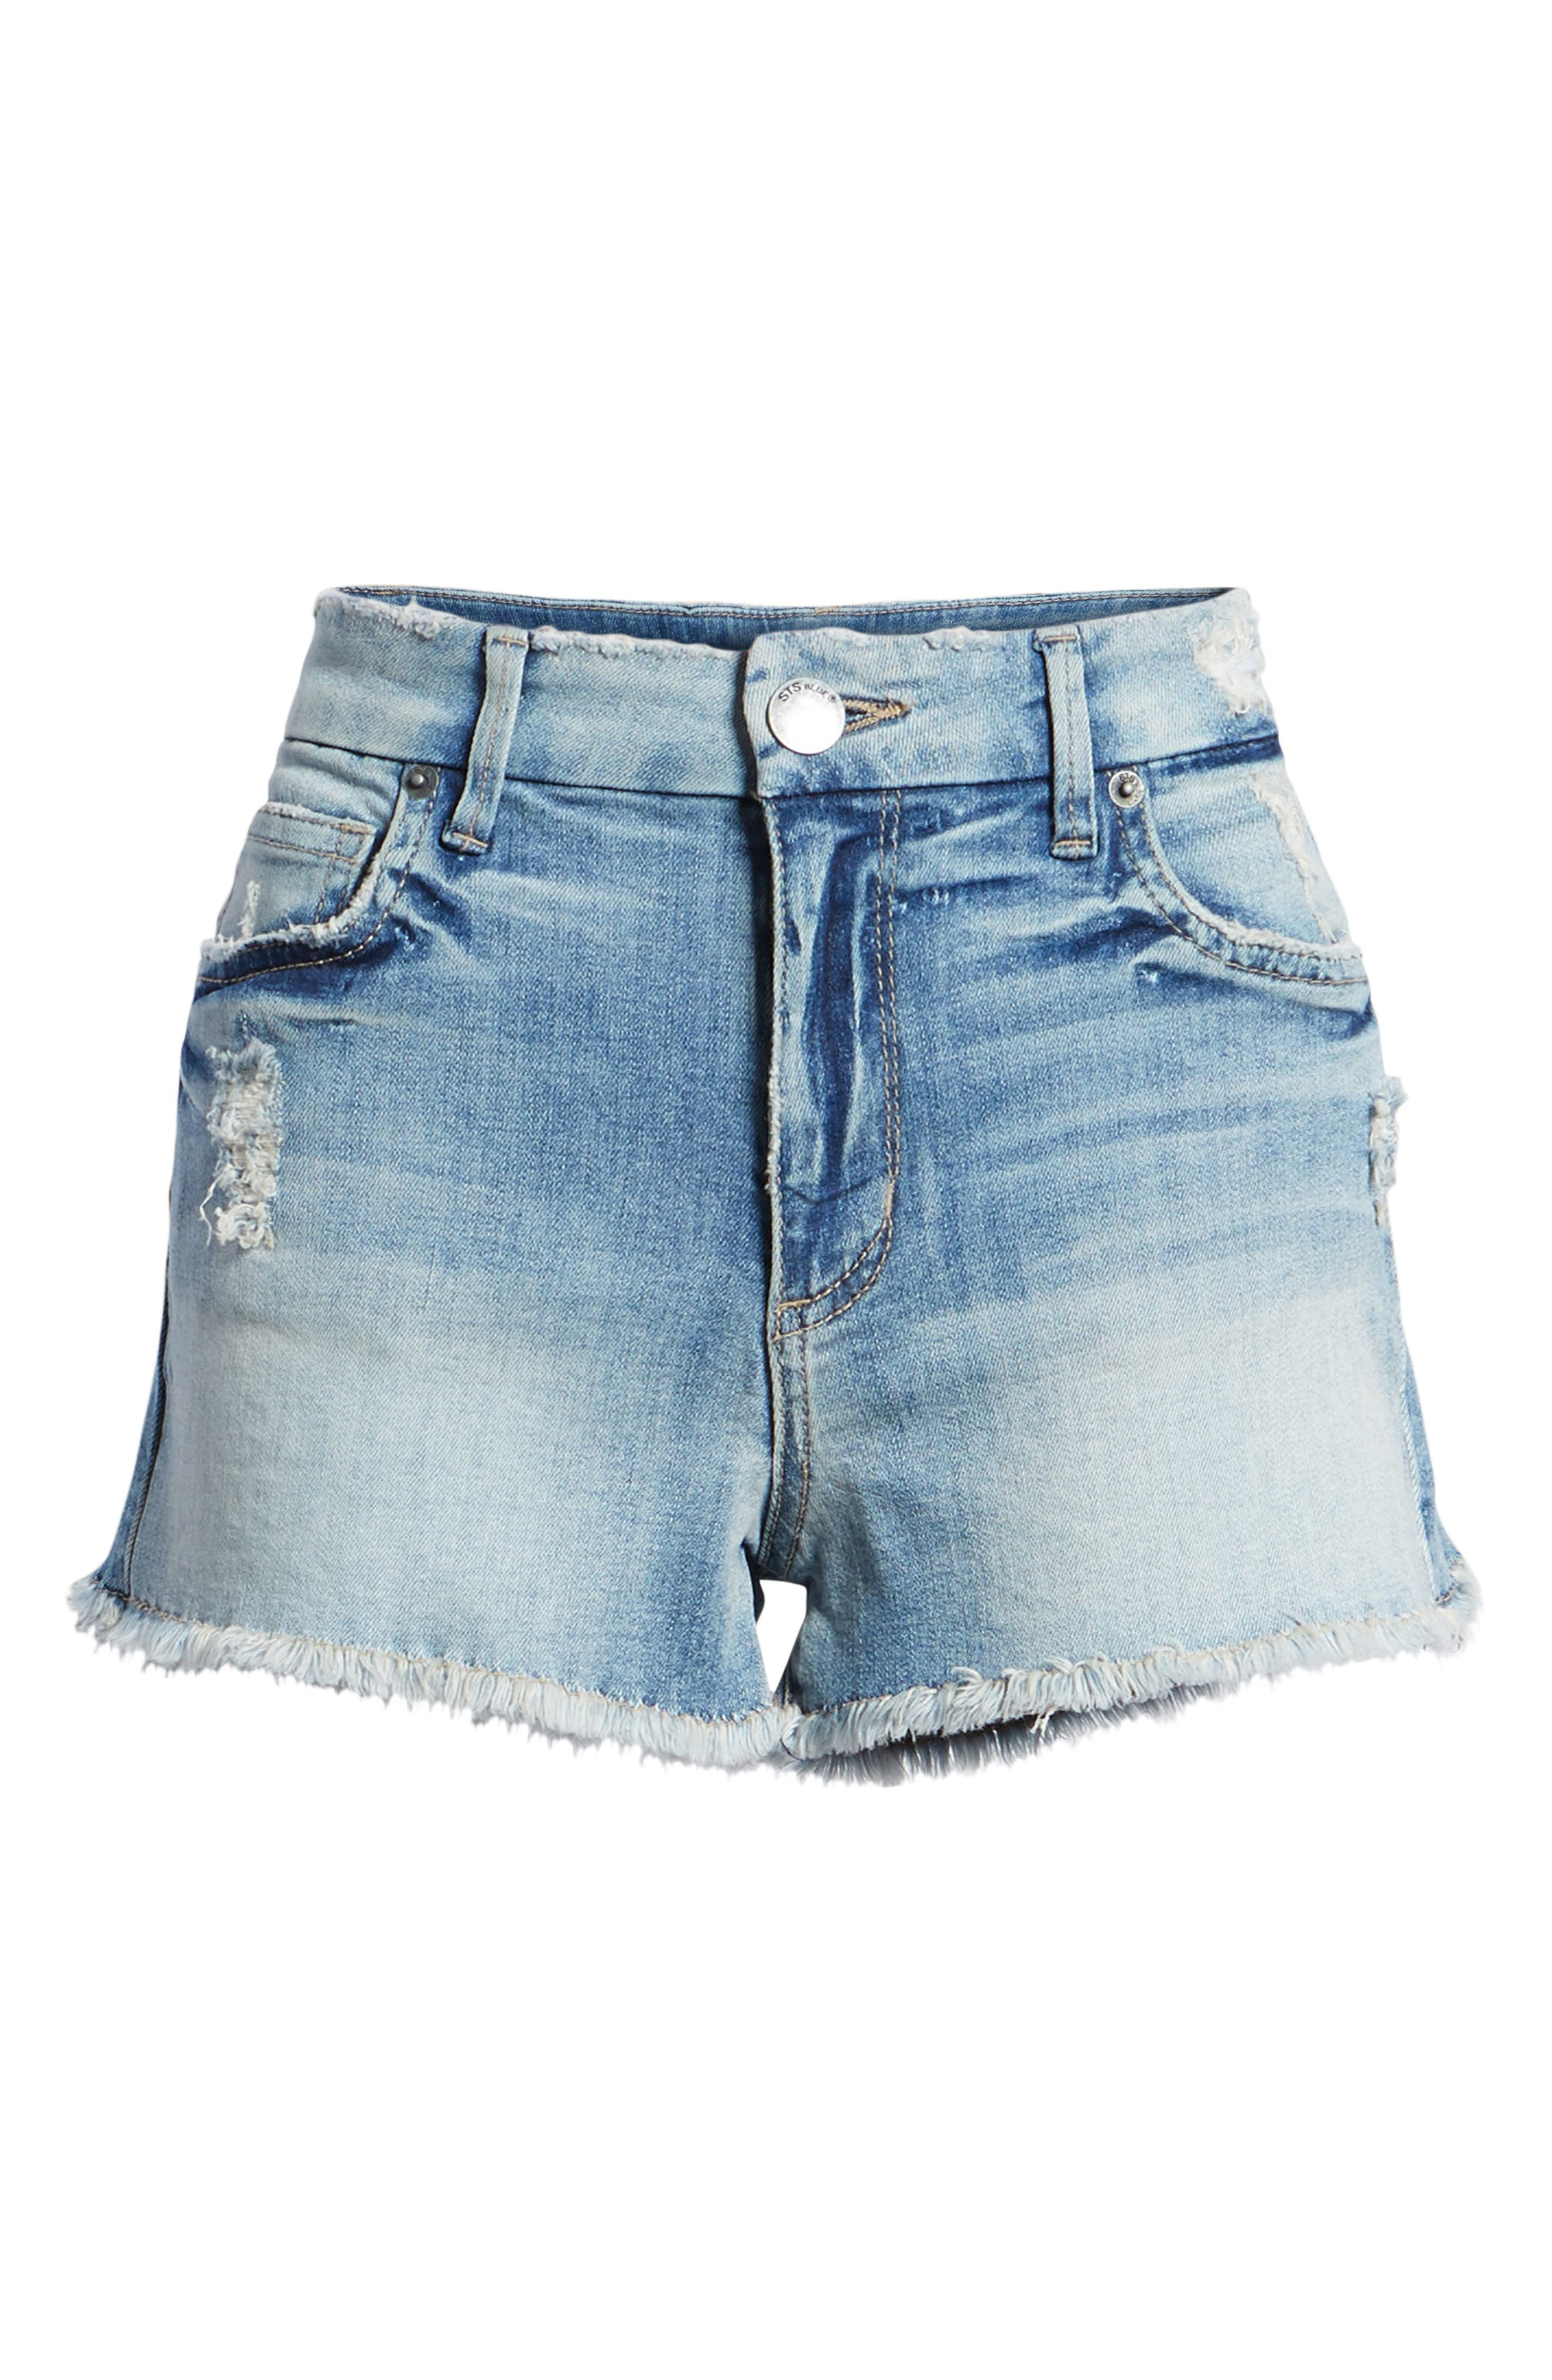 High Waist Boyfriend Shorts,                             Alternate thumbnail 7, color,                             400